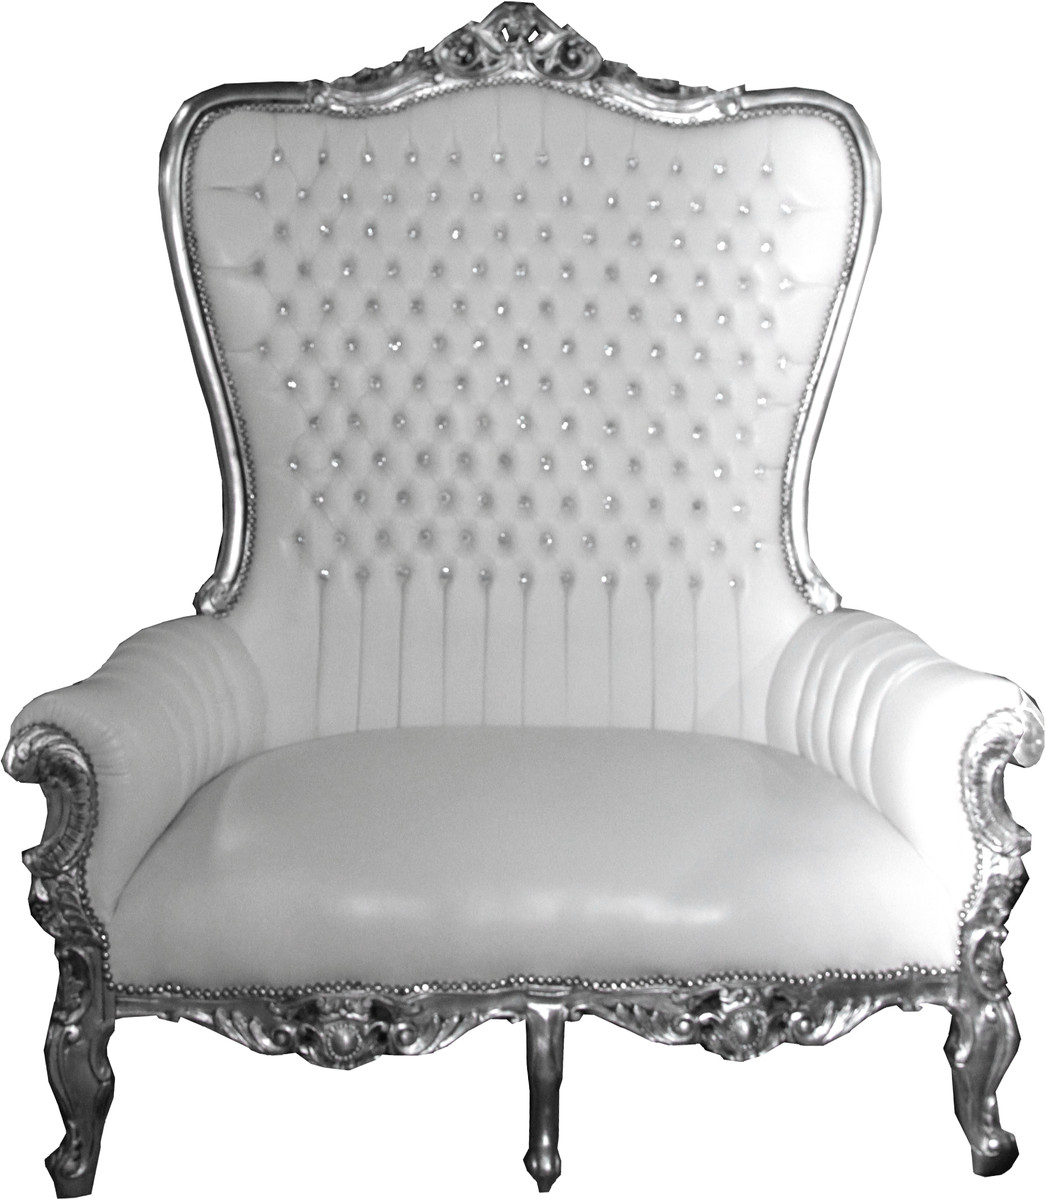 Casa Padrino Baroque Double Throne